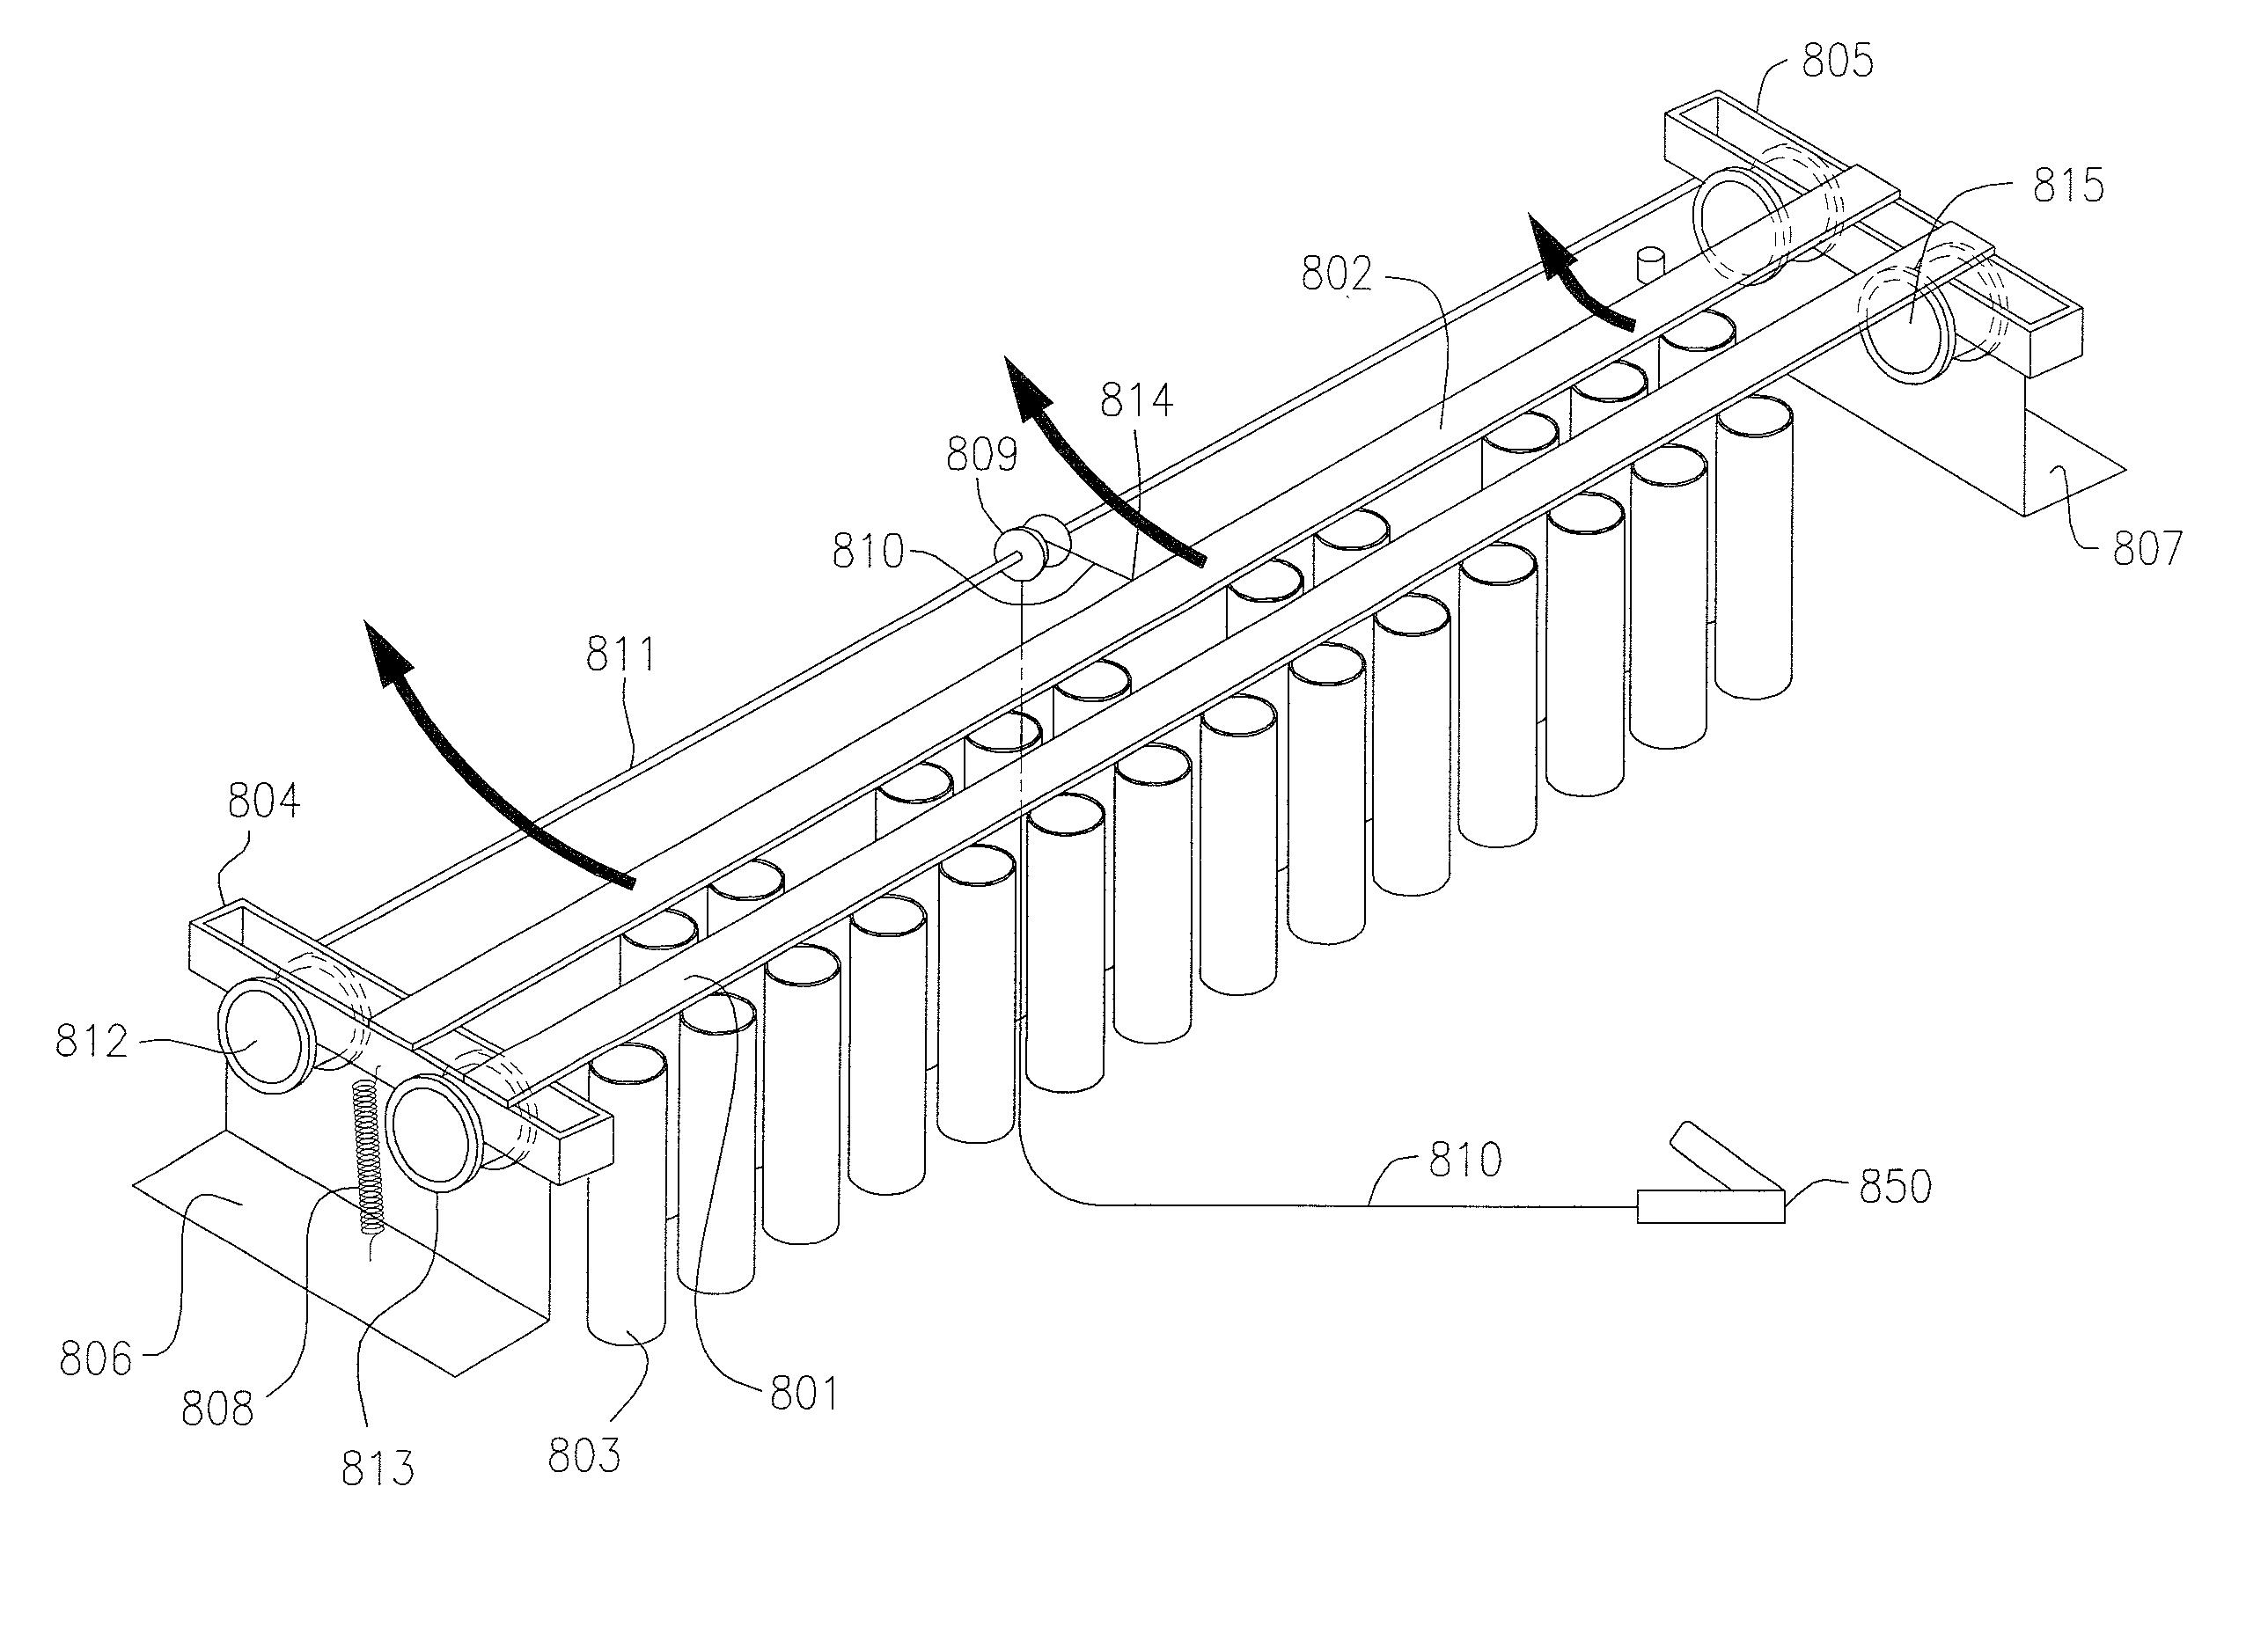 reese pod brake controller wiring diagram 2002 gmc sonoma stereo imageresizertool com